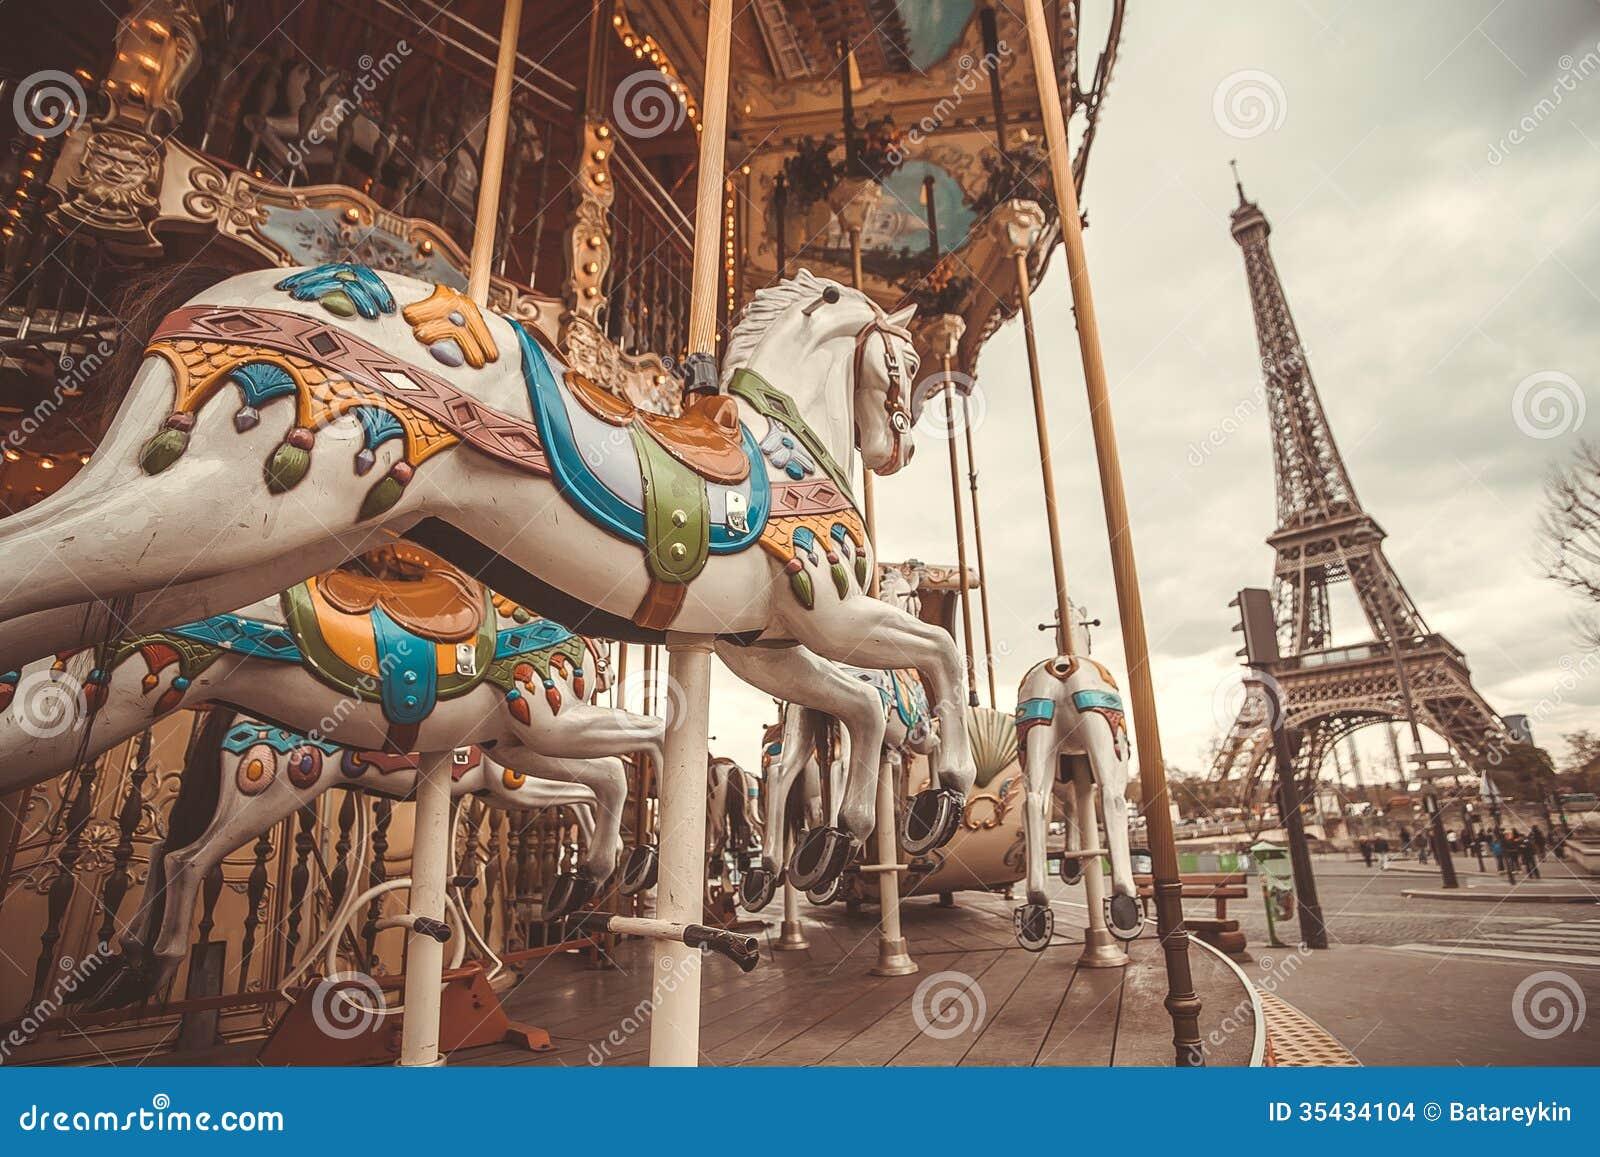 Vintage Carousel In Paris Stock Images - Image: 35434104